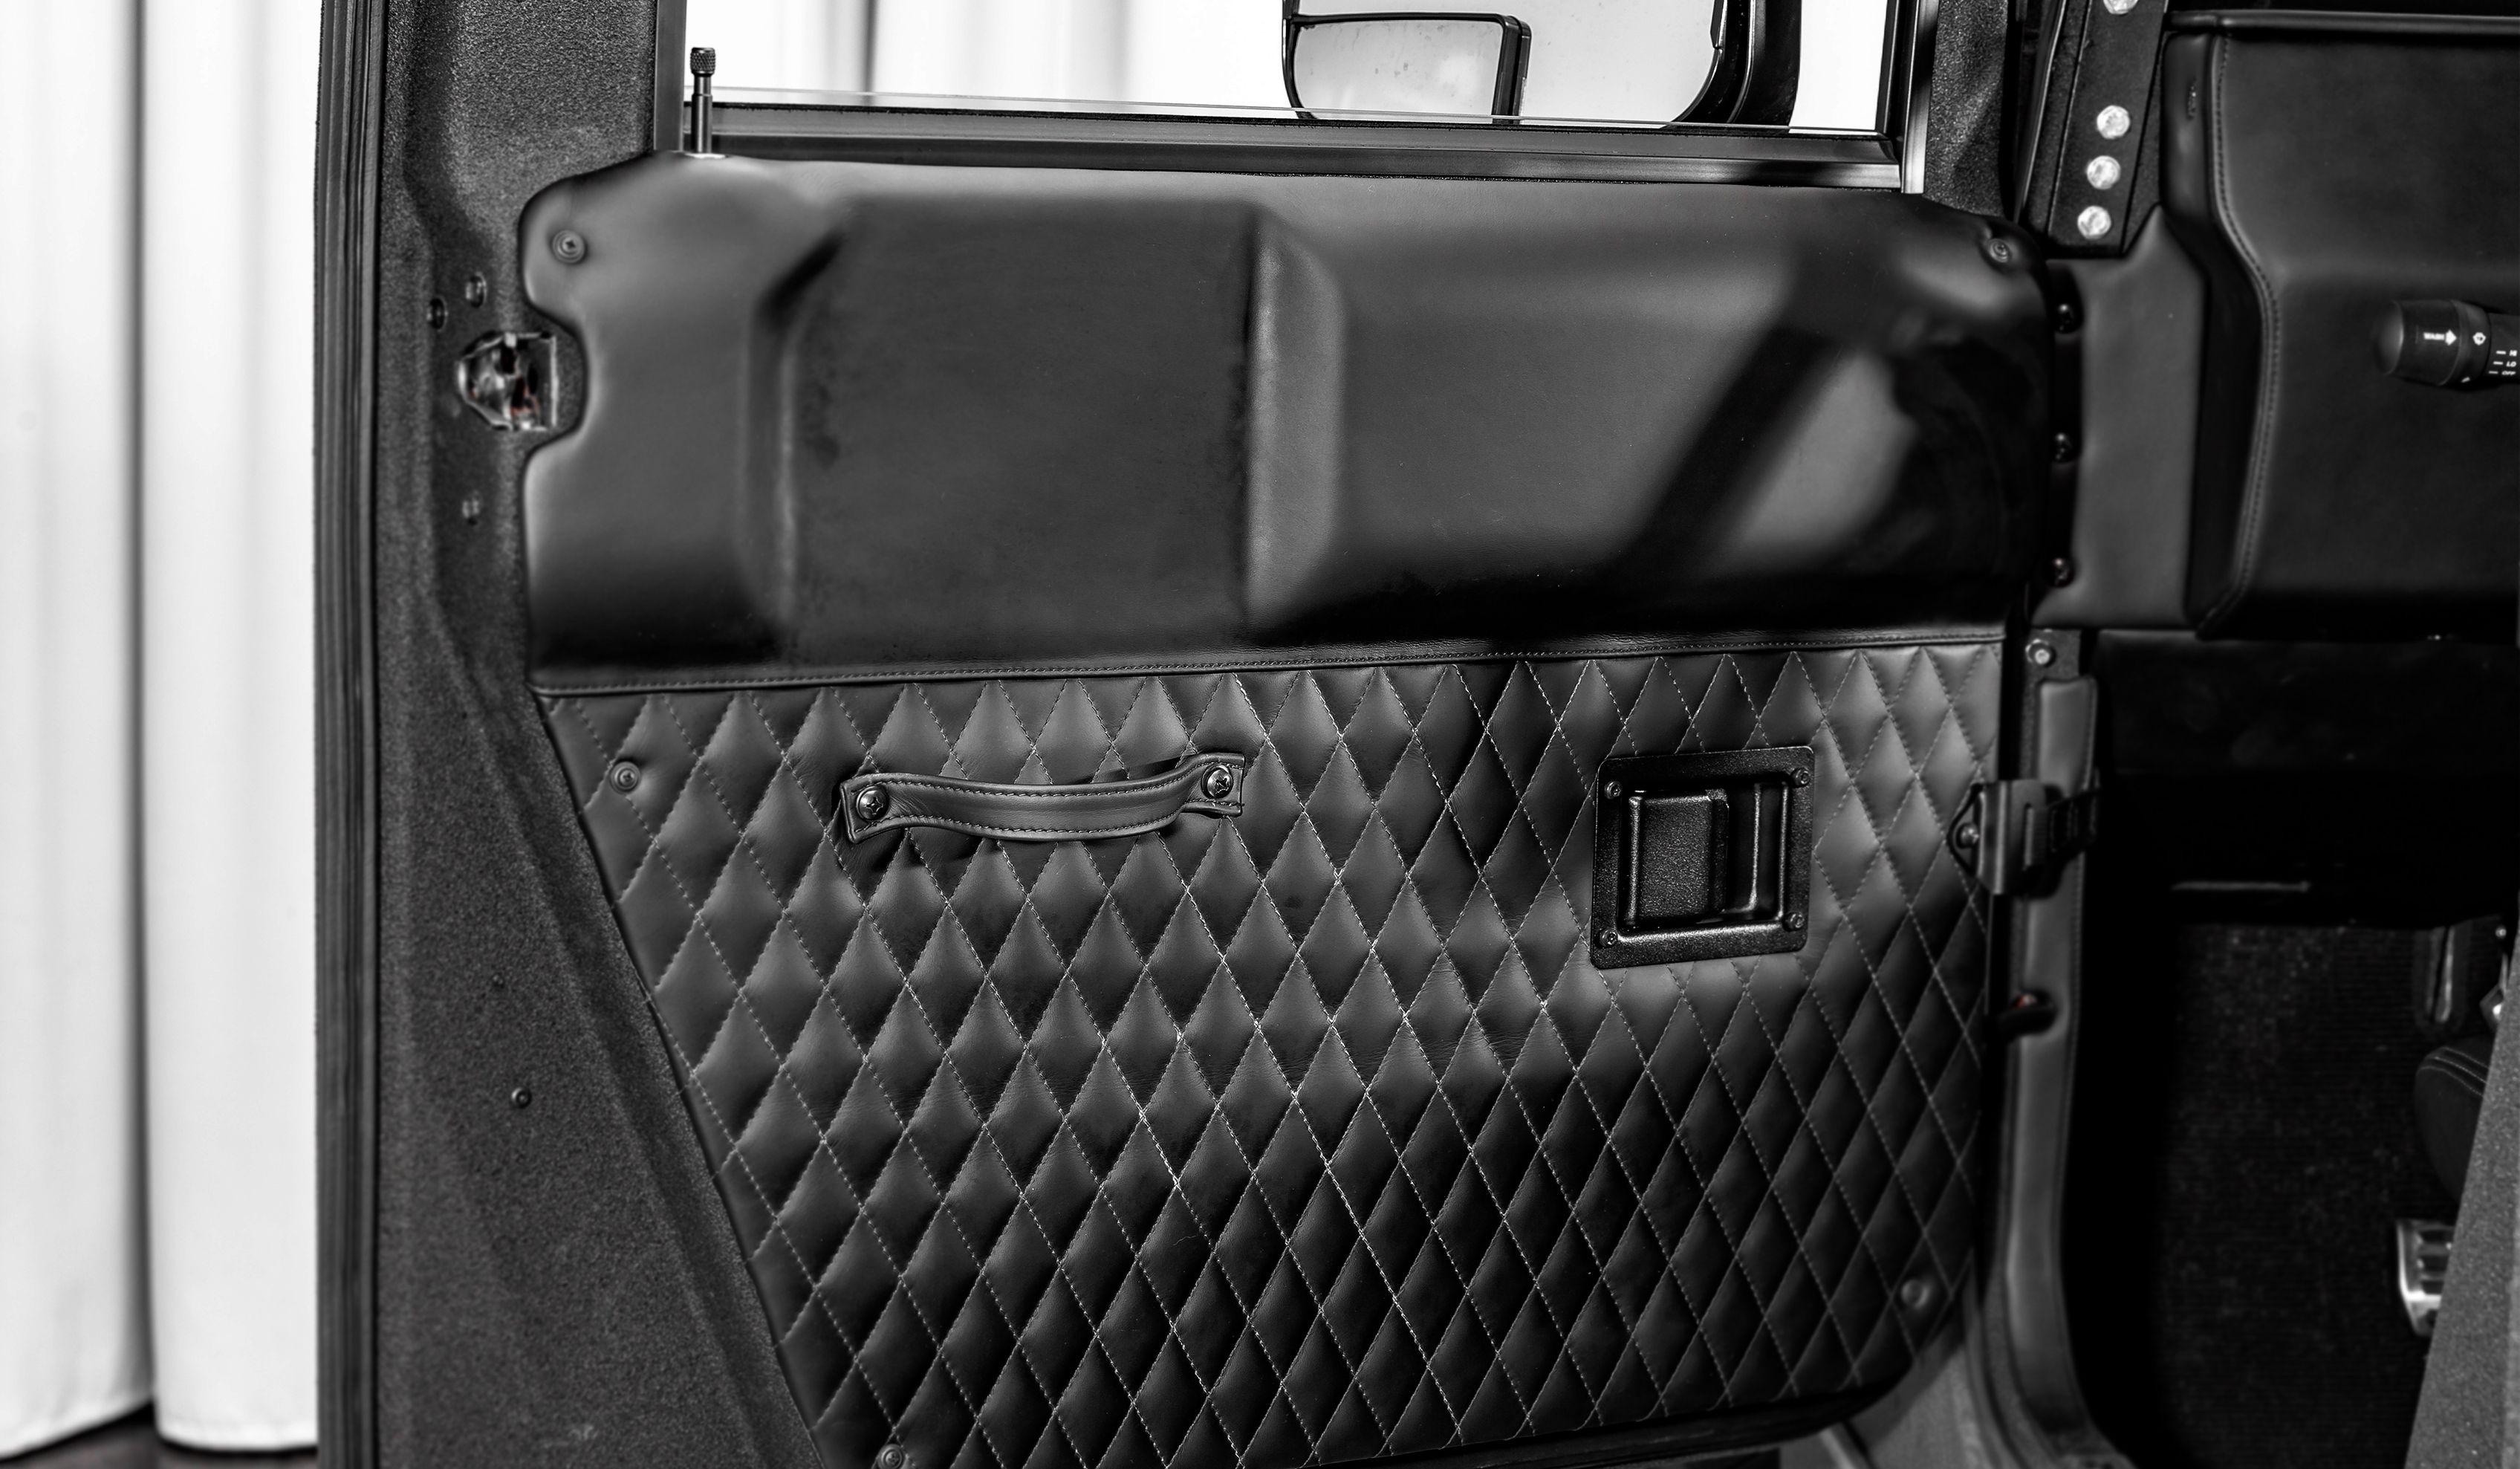 Mil-Spec-Hummer-H1-pickup-hardtot-launch-edition-2019-15